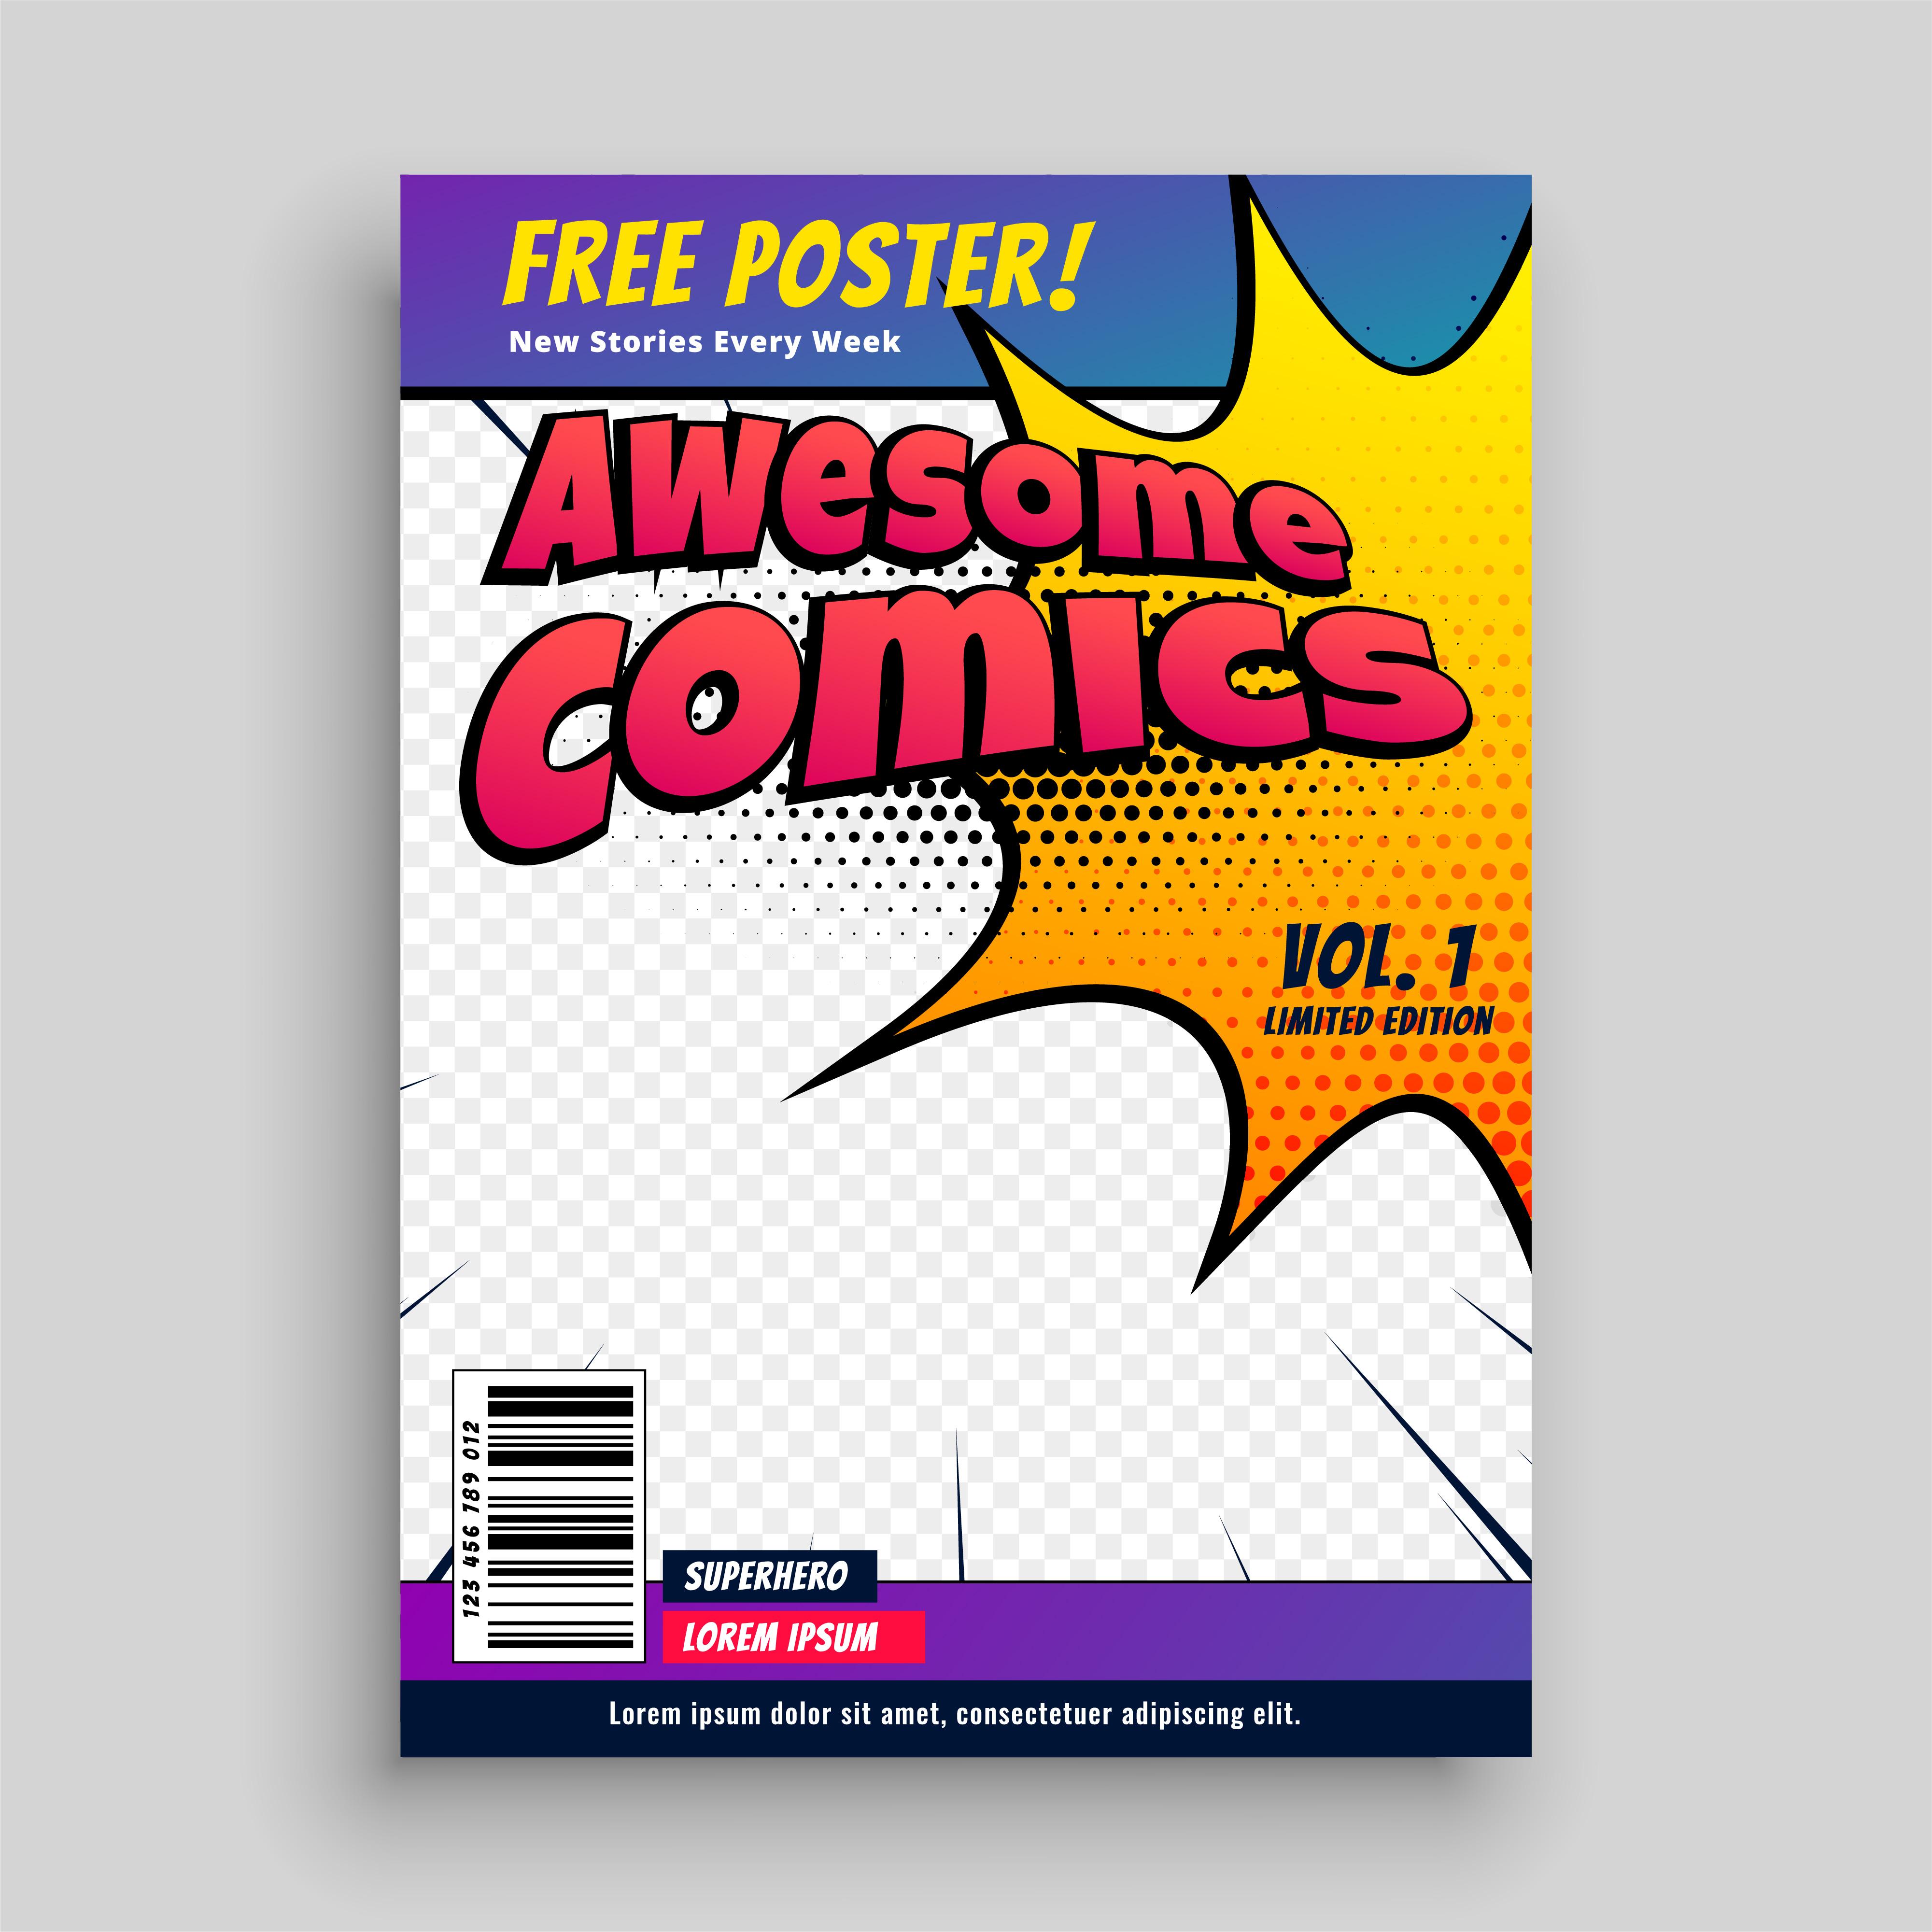 Comic-Buch-Cover-Magazin-Design-Vorlage - Kostenlose Vektor-Kunst ...